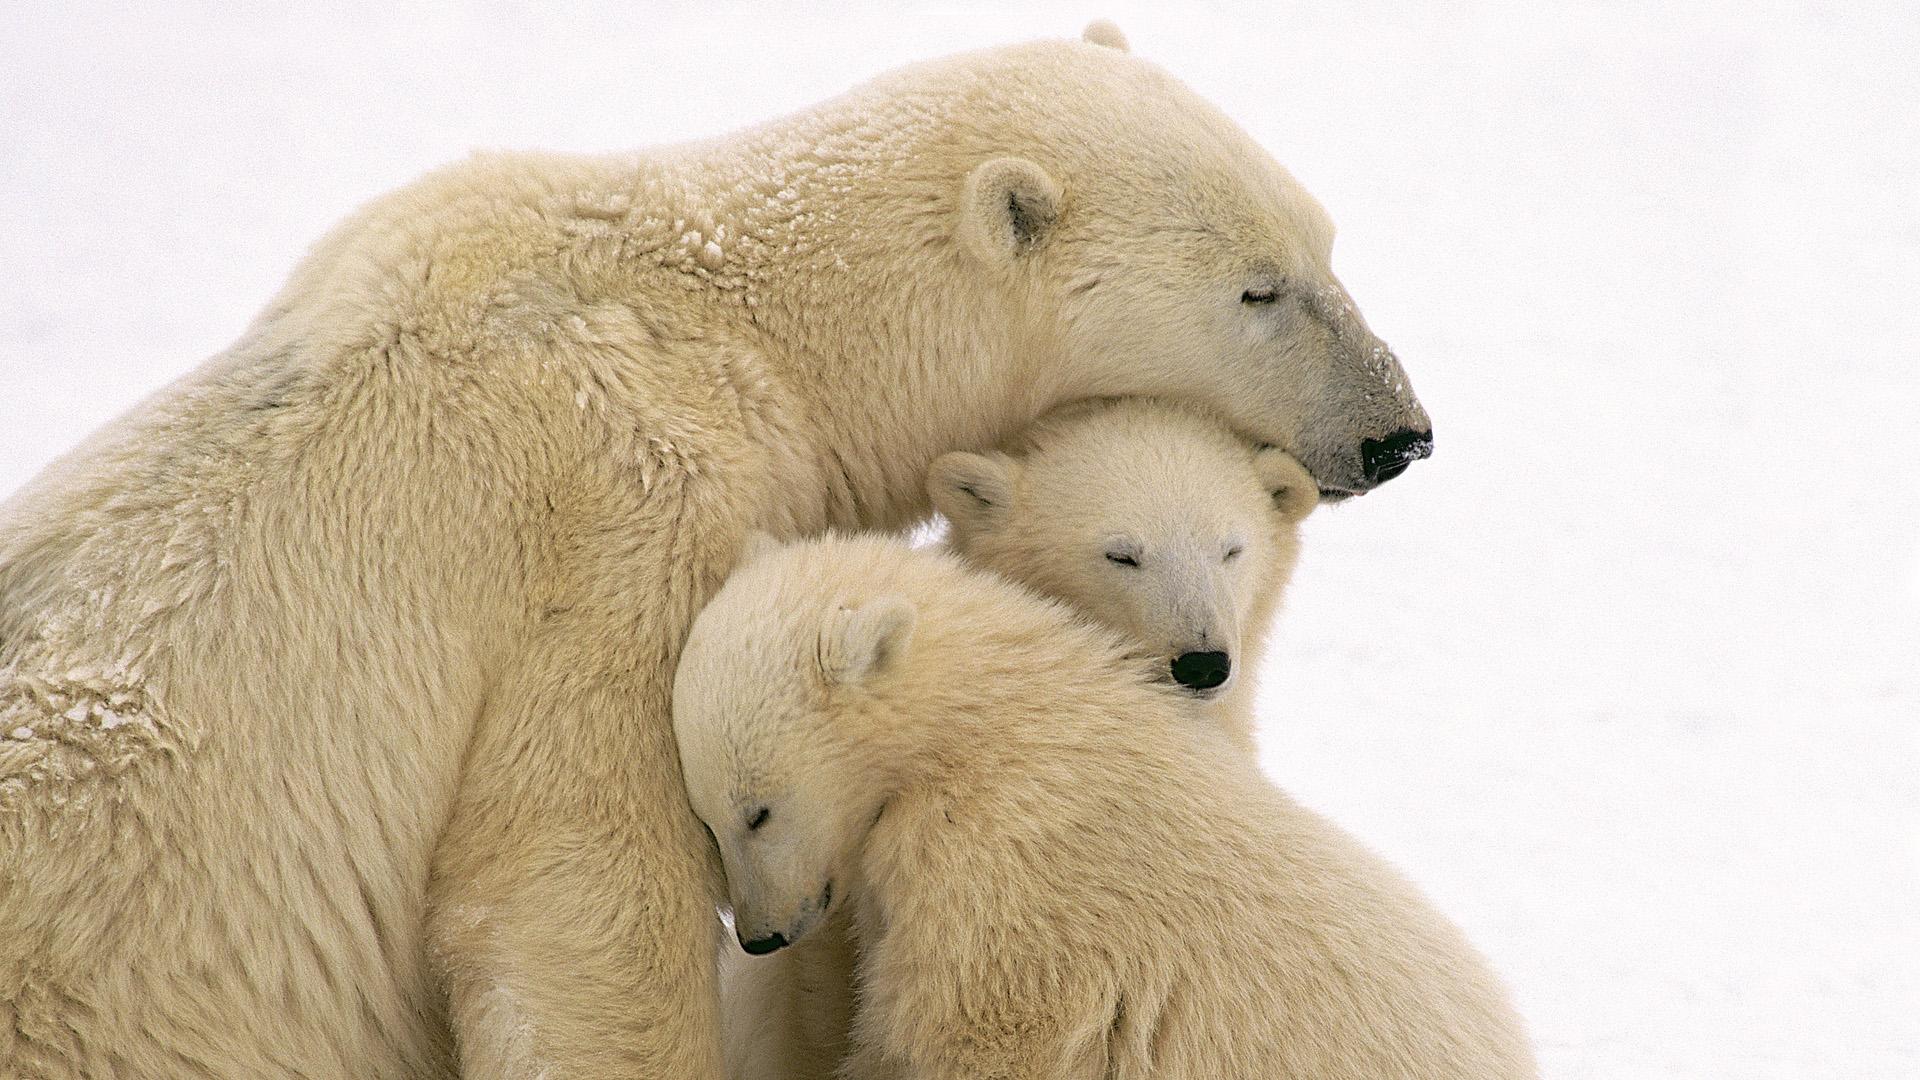 Cute Polar Bear Family Wallpaper HD 10849 Wallpaper High Resolution 1920x1080